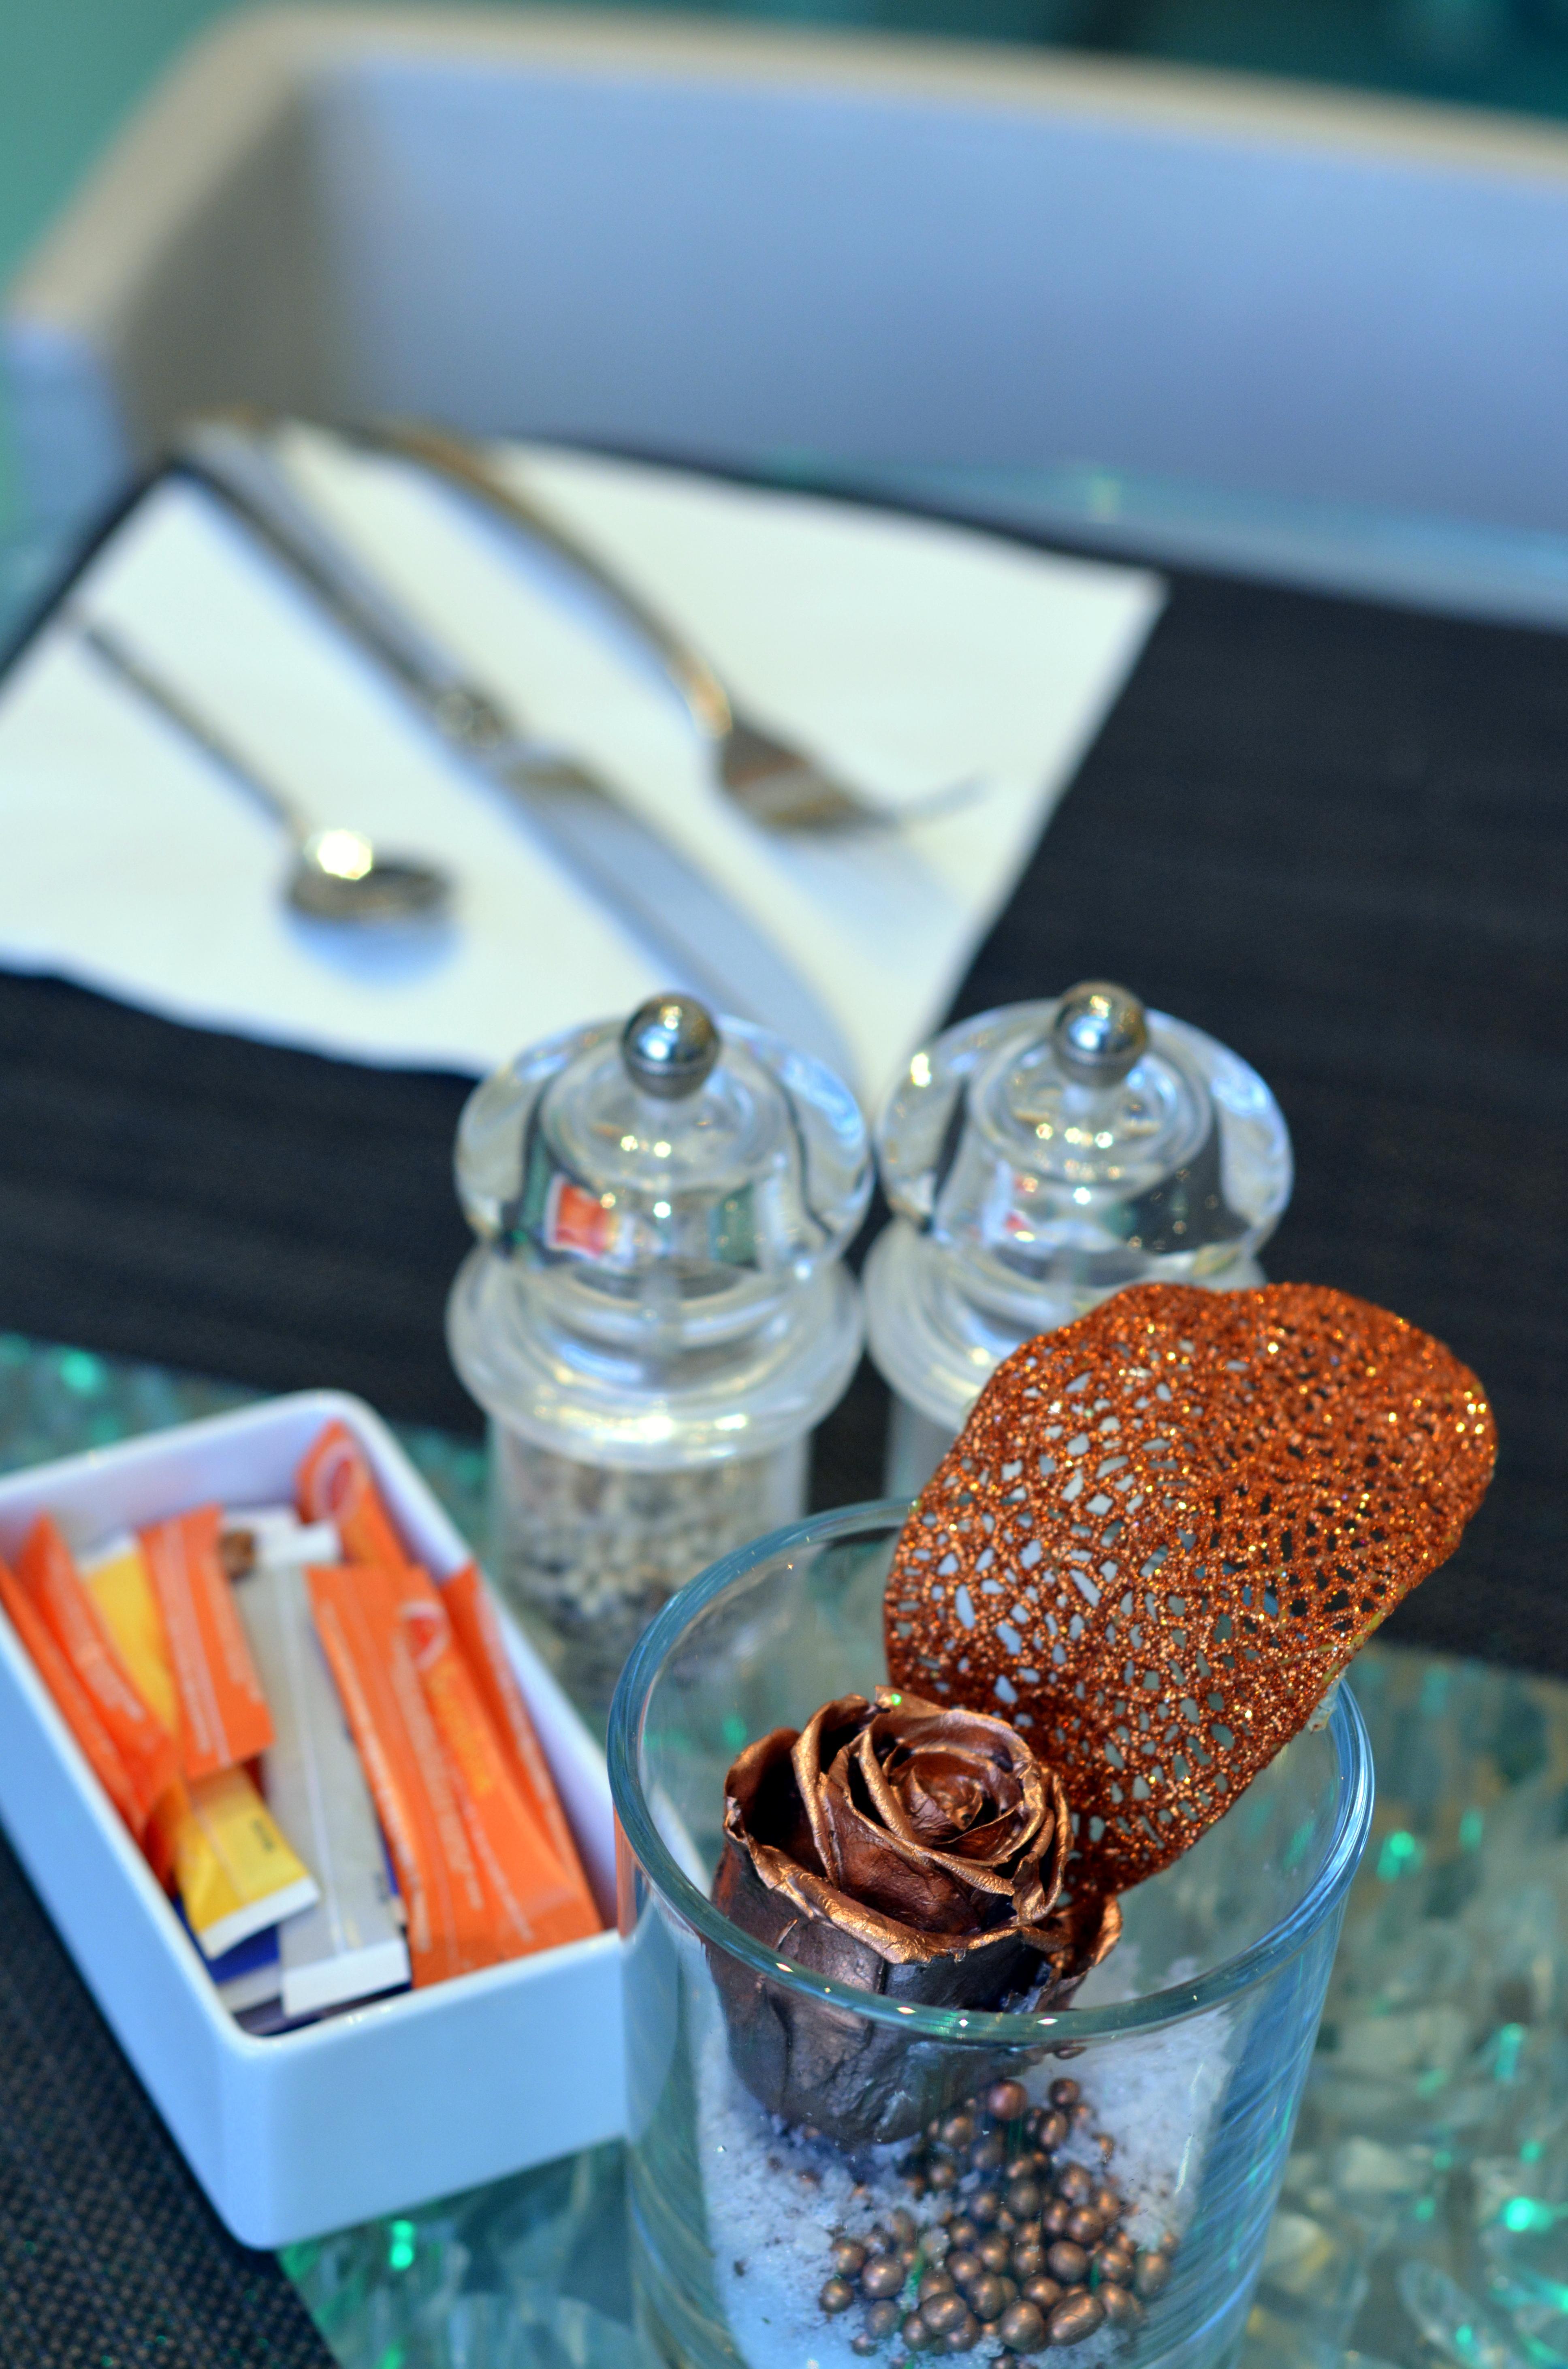 Petit-déjeuner au Novotel Monte-Carlo